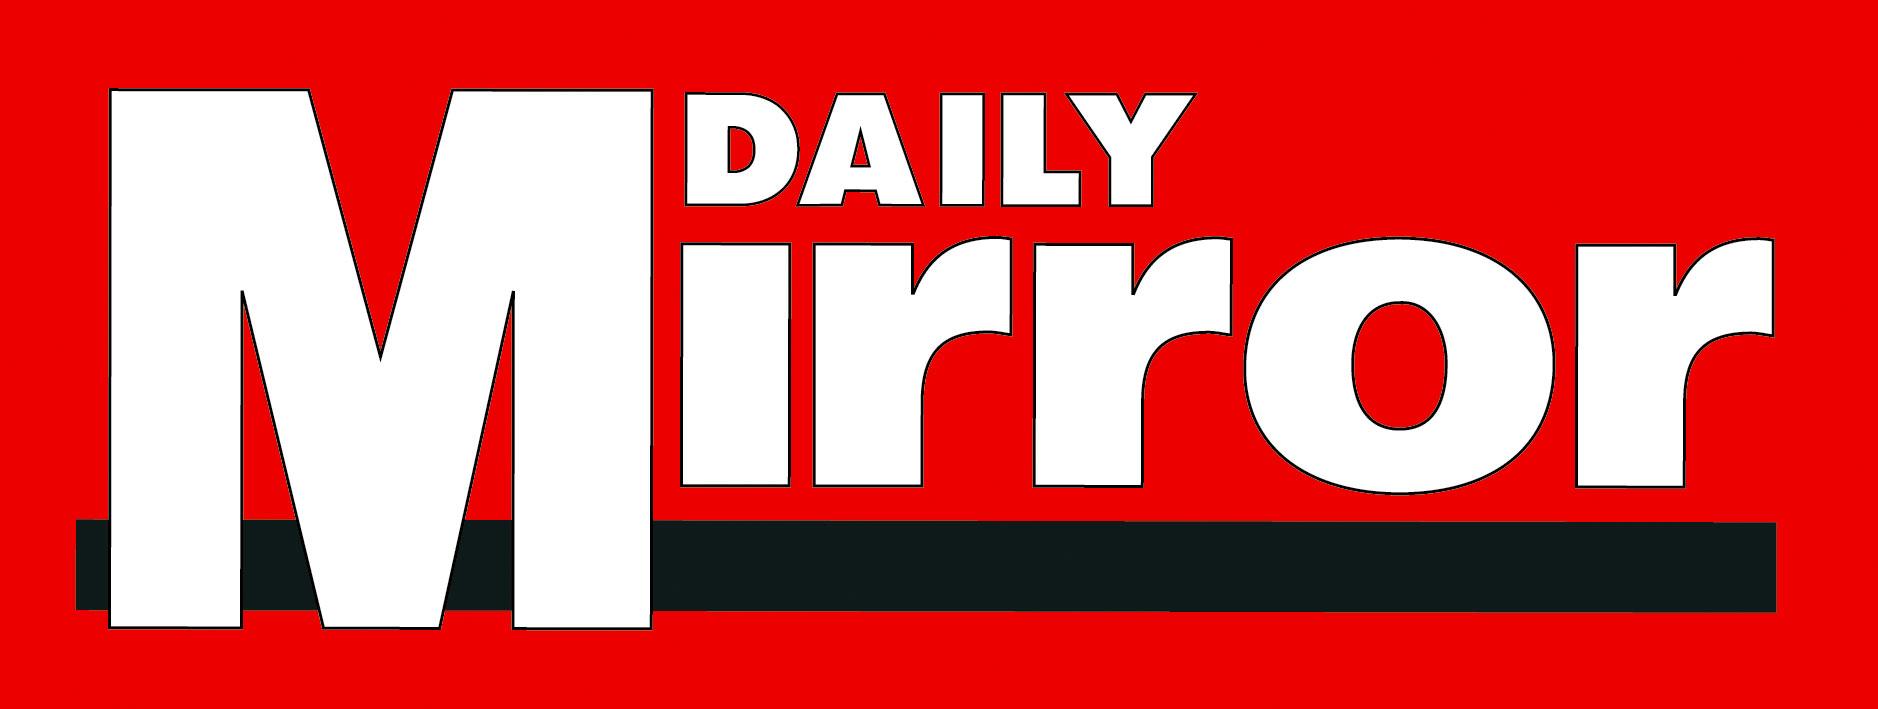 Daily-Mirror-Logo.jpg